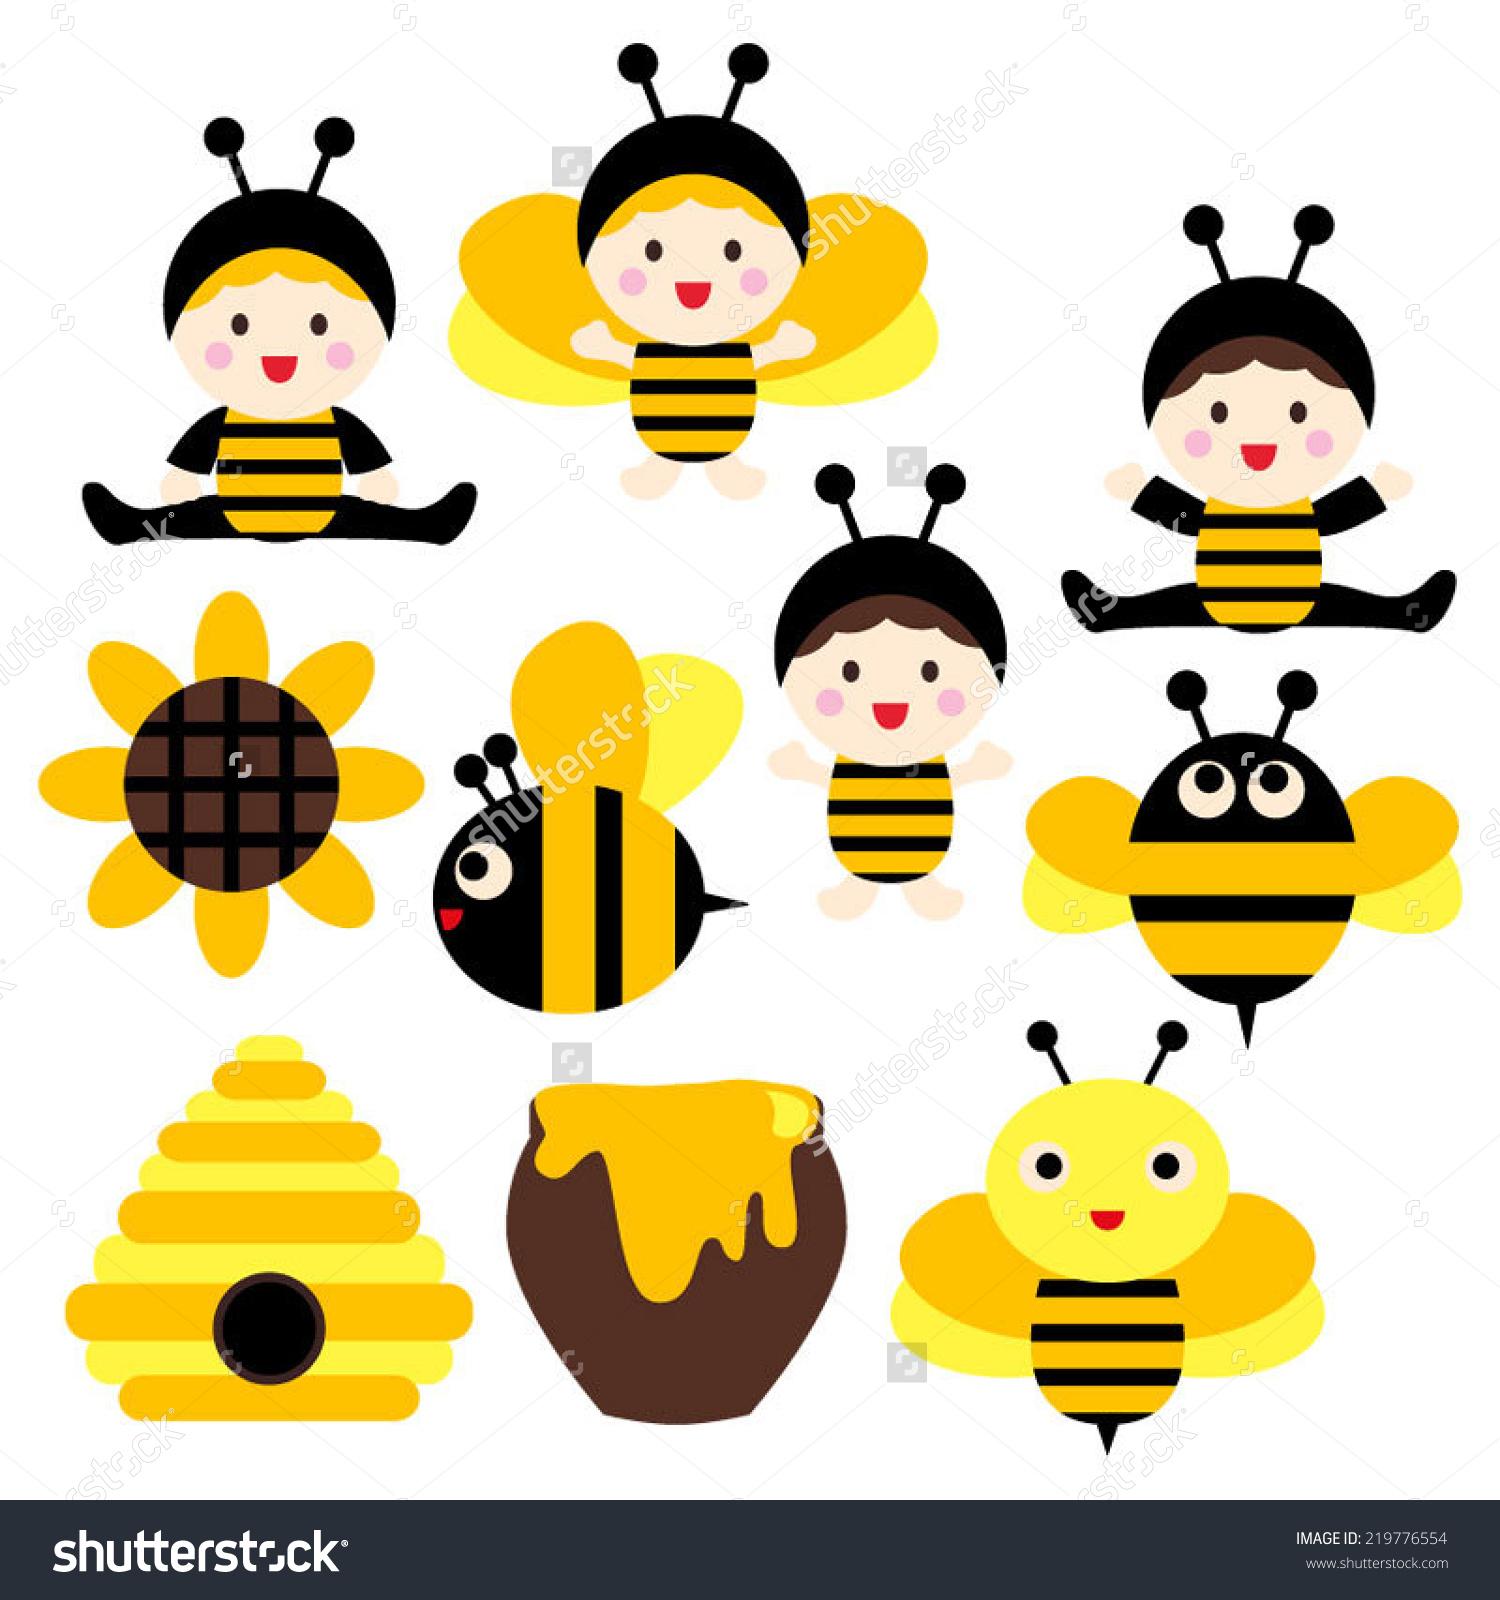 Cute Babies Bee Costumes Black Yellow Stock Vector 219776554.